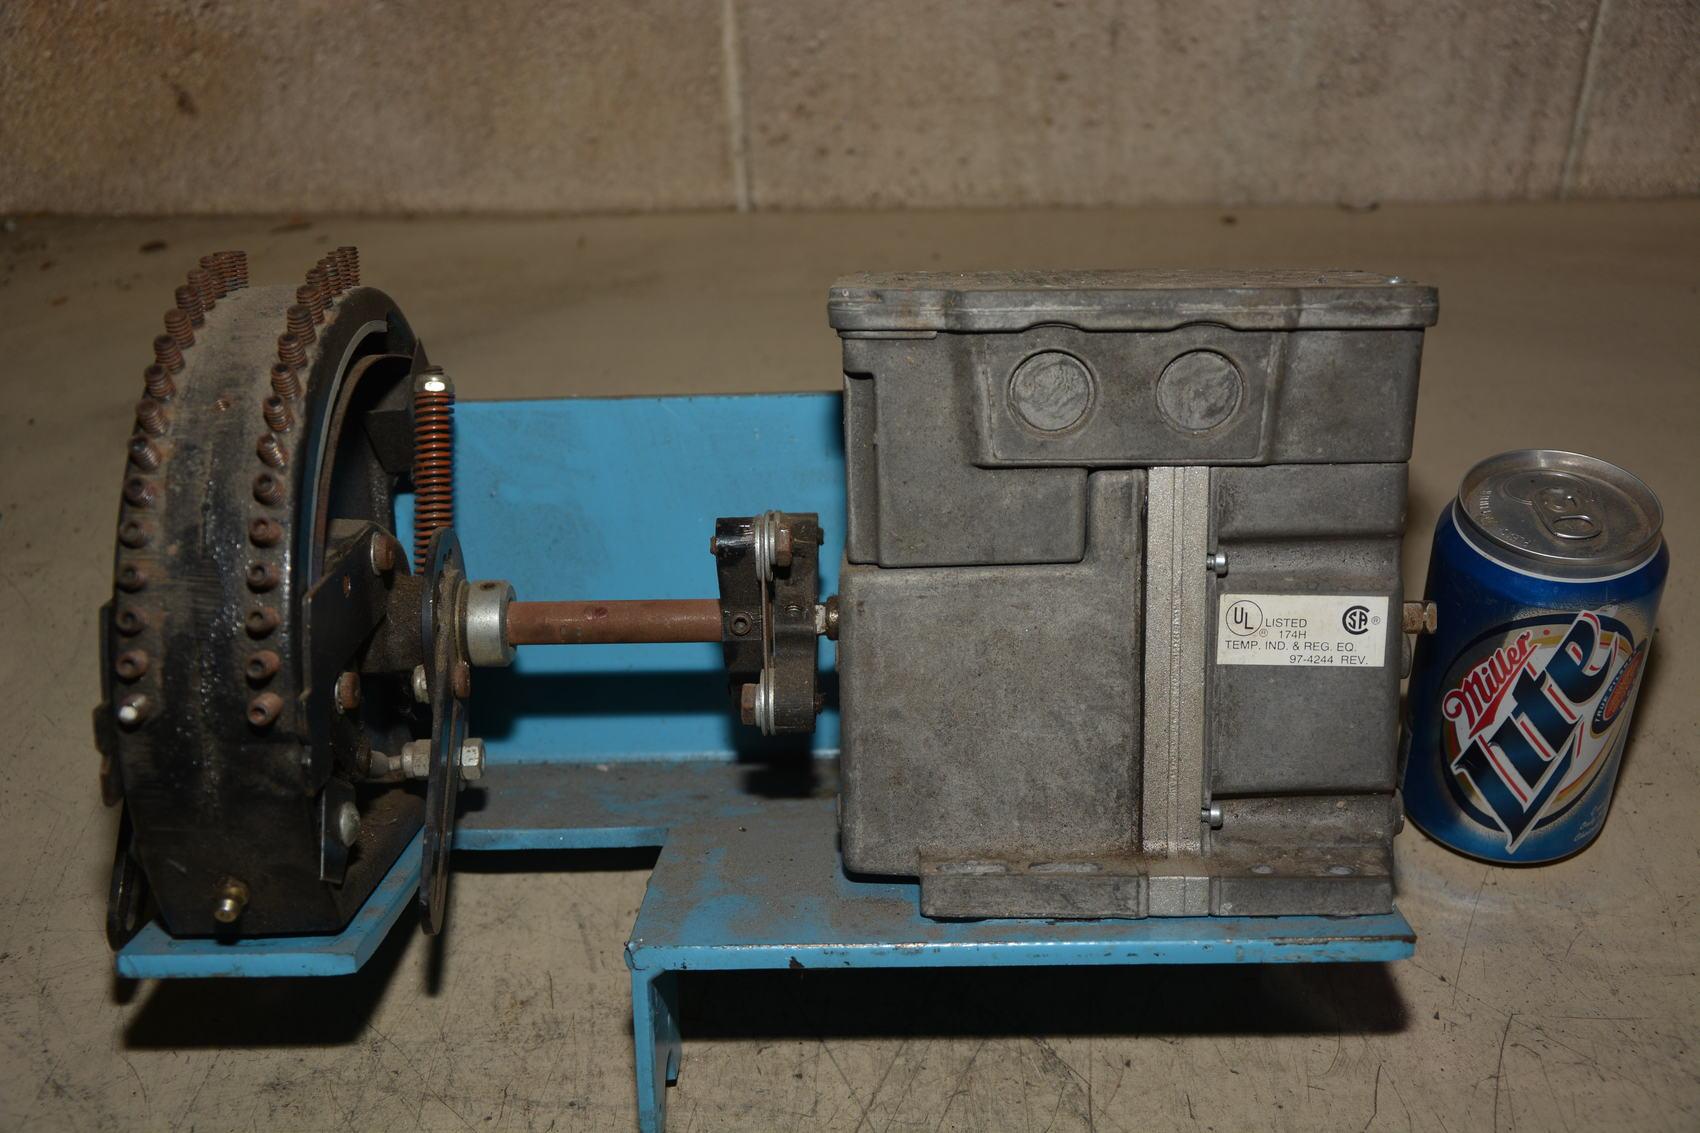 Honeywell Modutrol Iv Motor M9174c1025 Stroke 90 120v 30 Sec